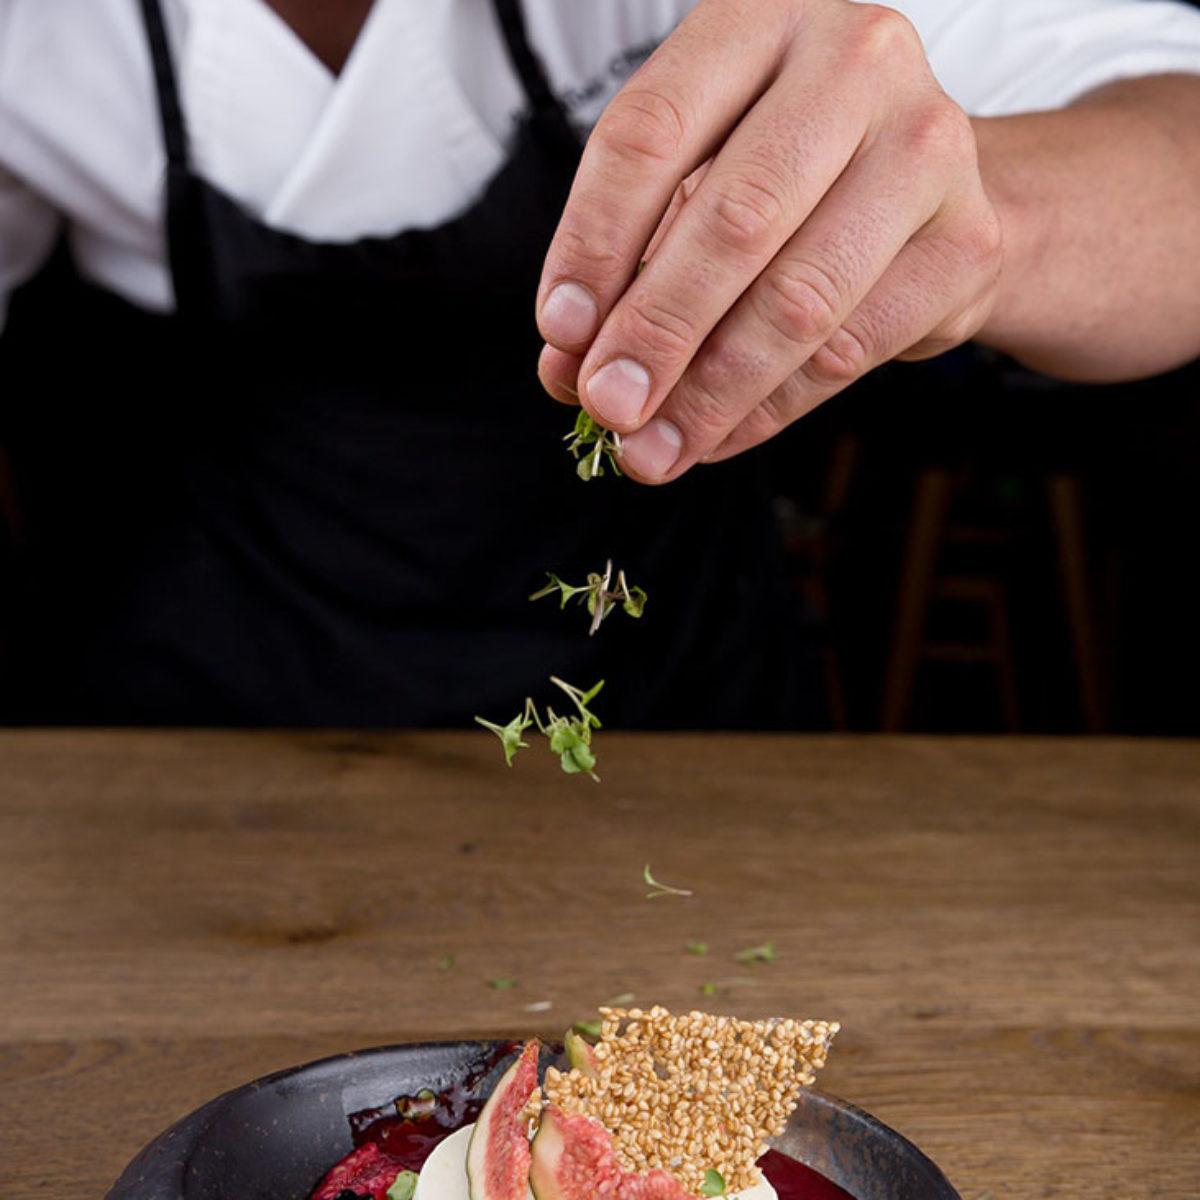 Yiamas Gastro Bar - Καλαμάτα - Μοντέρνα Ευρωπαϊκή Κουζίνα - Gastronomy 23